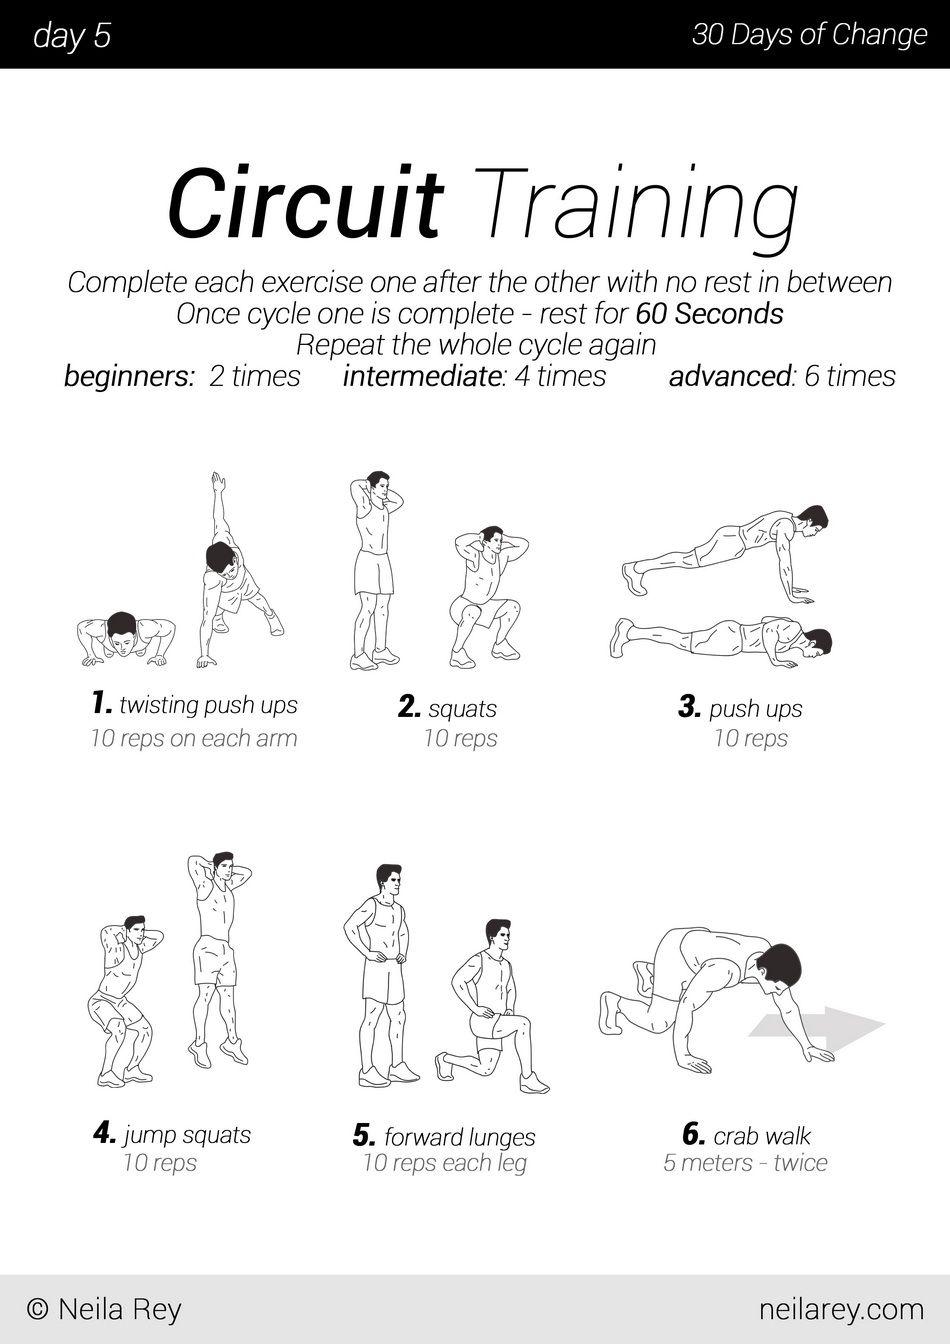 The ultimate day calisthenics cardio exercise regimen